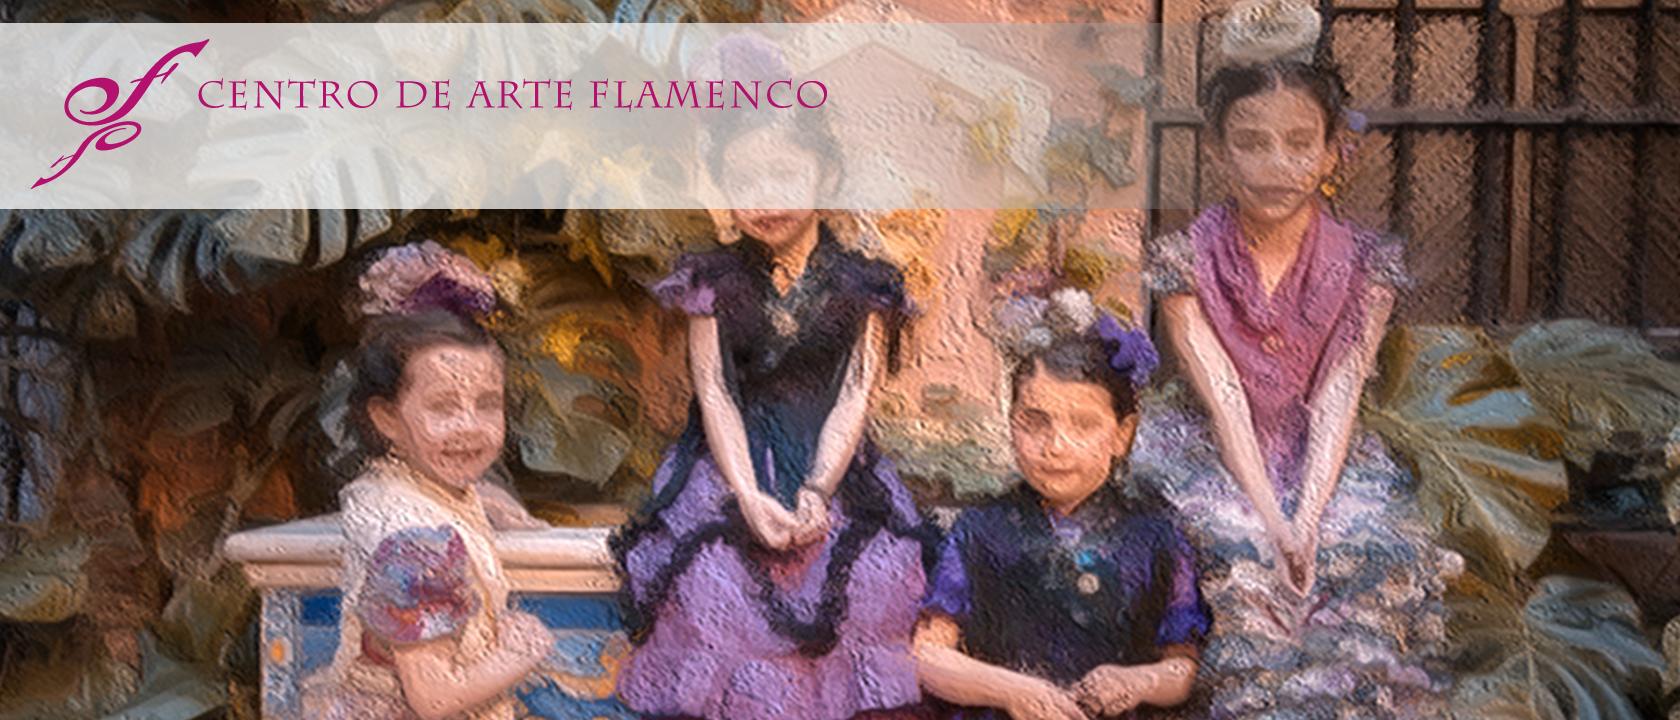 Neuer Flamencokurs für Kinder ab Oktober 2018